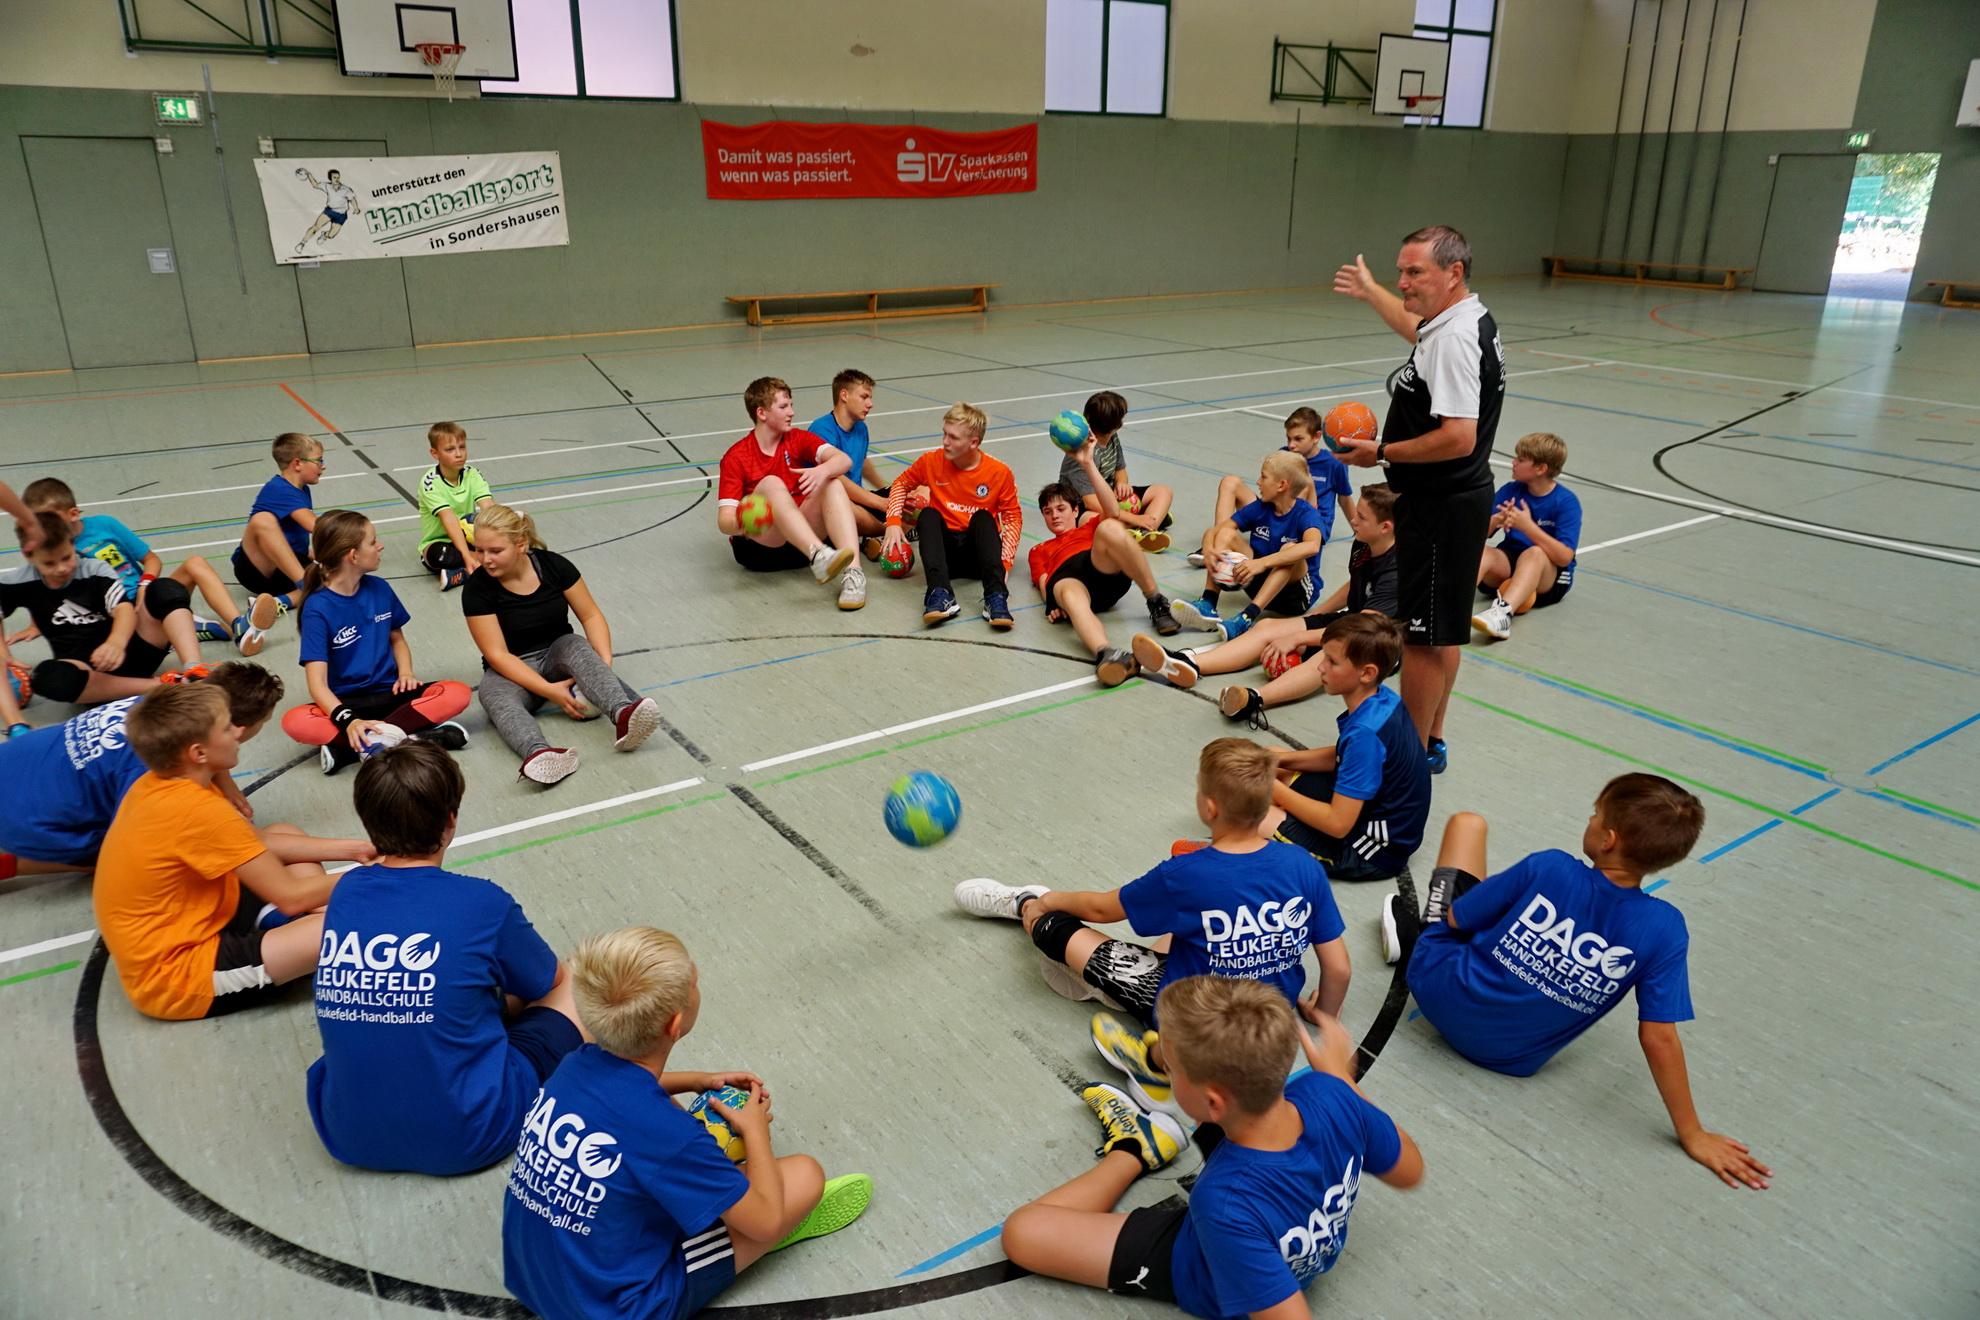 201808_Handballcamp_SDH_MG_163w